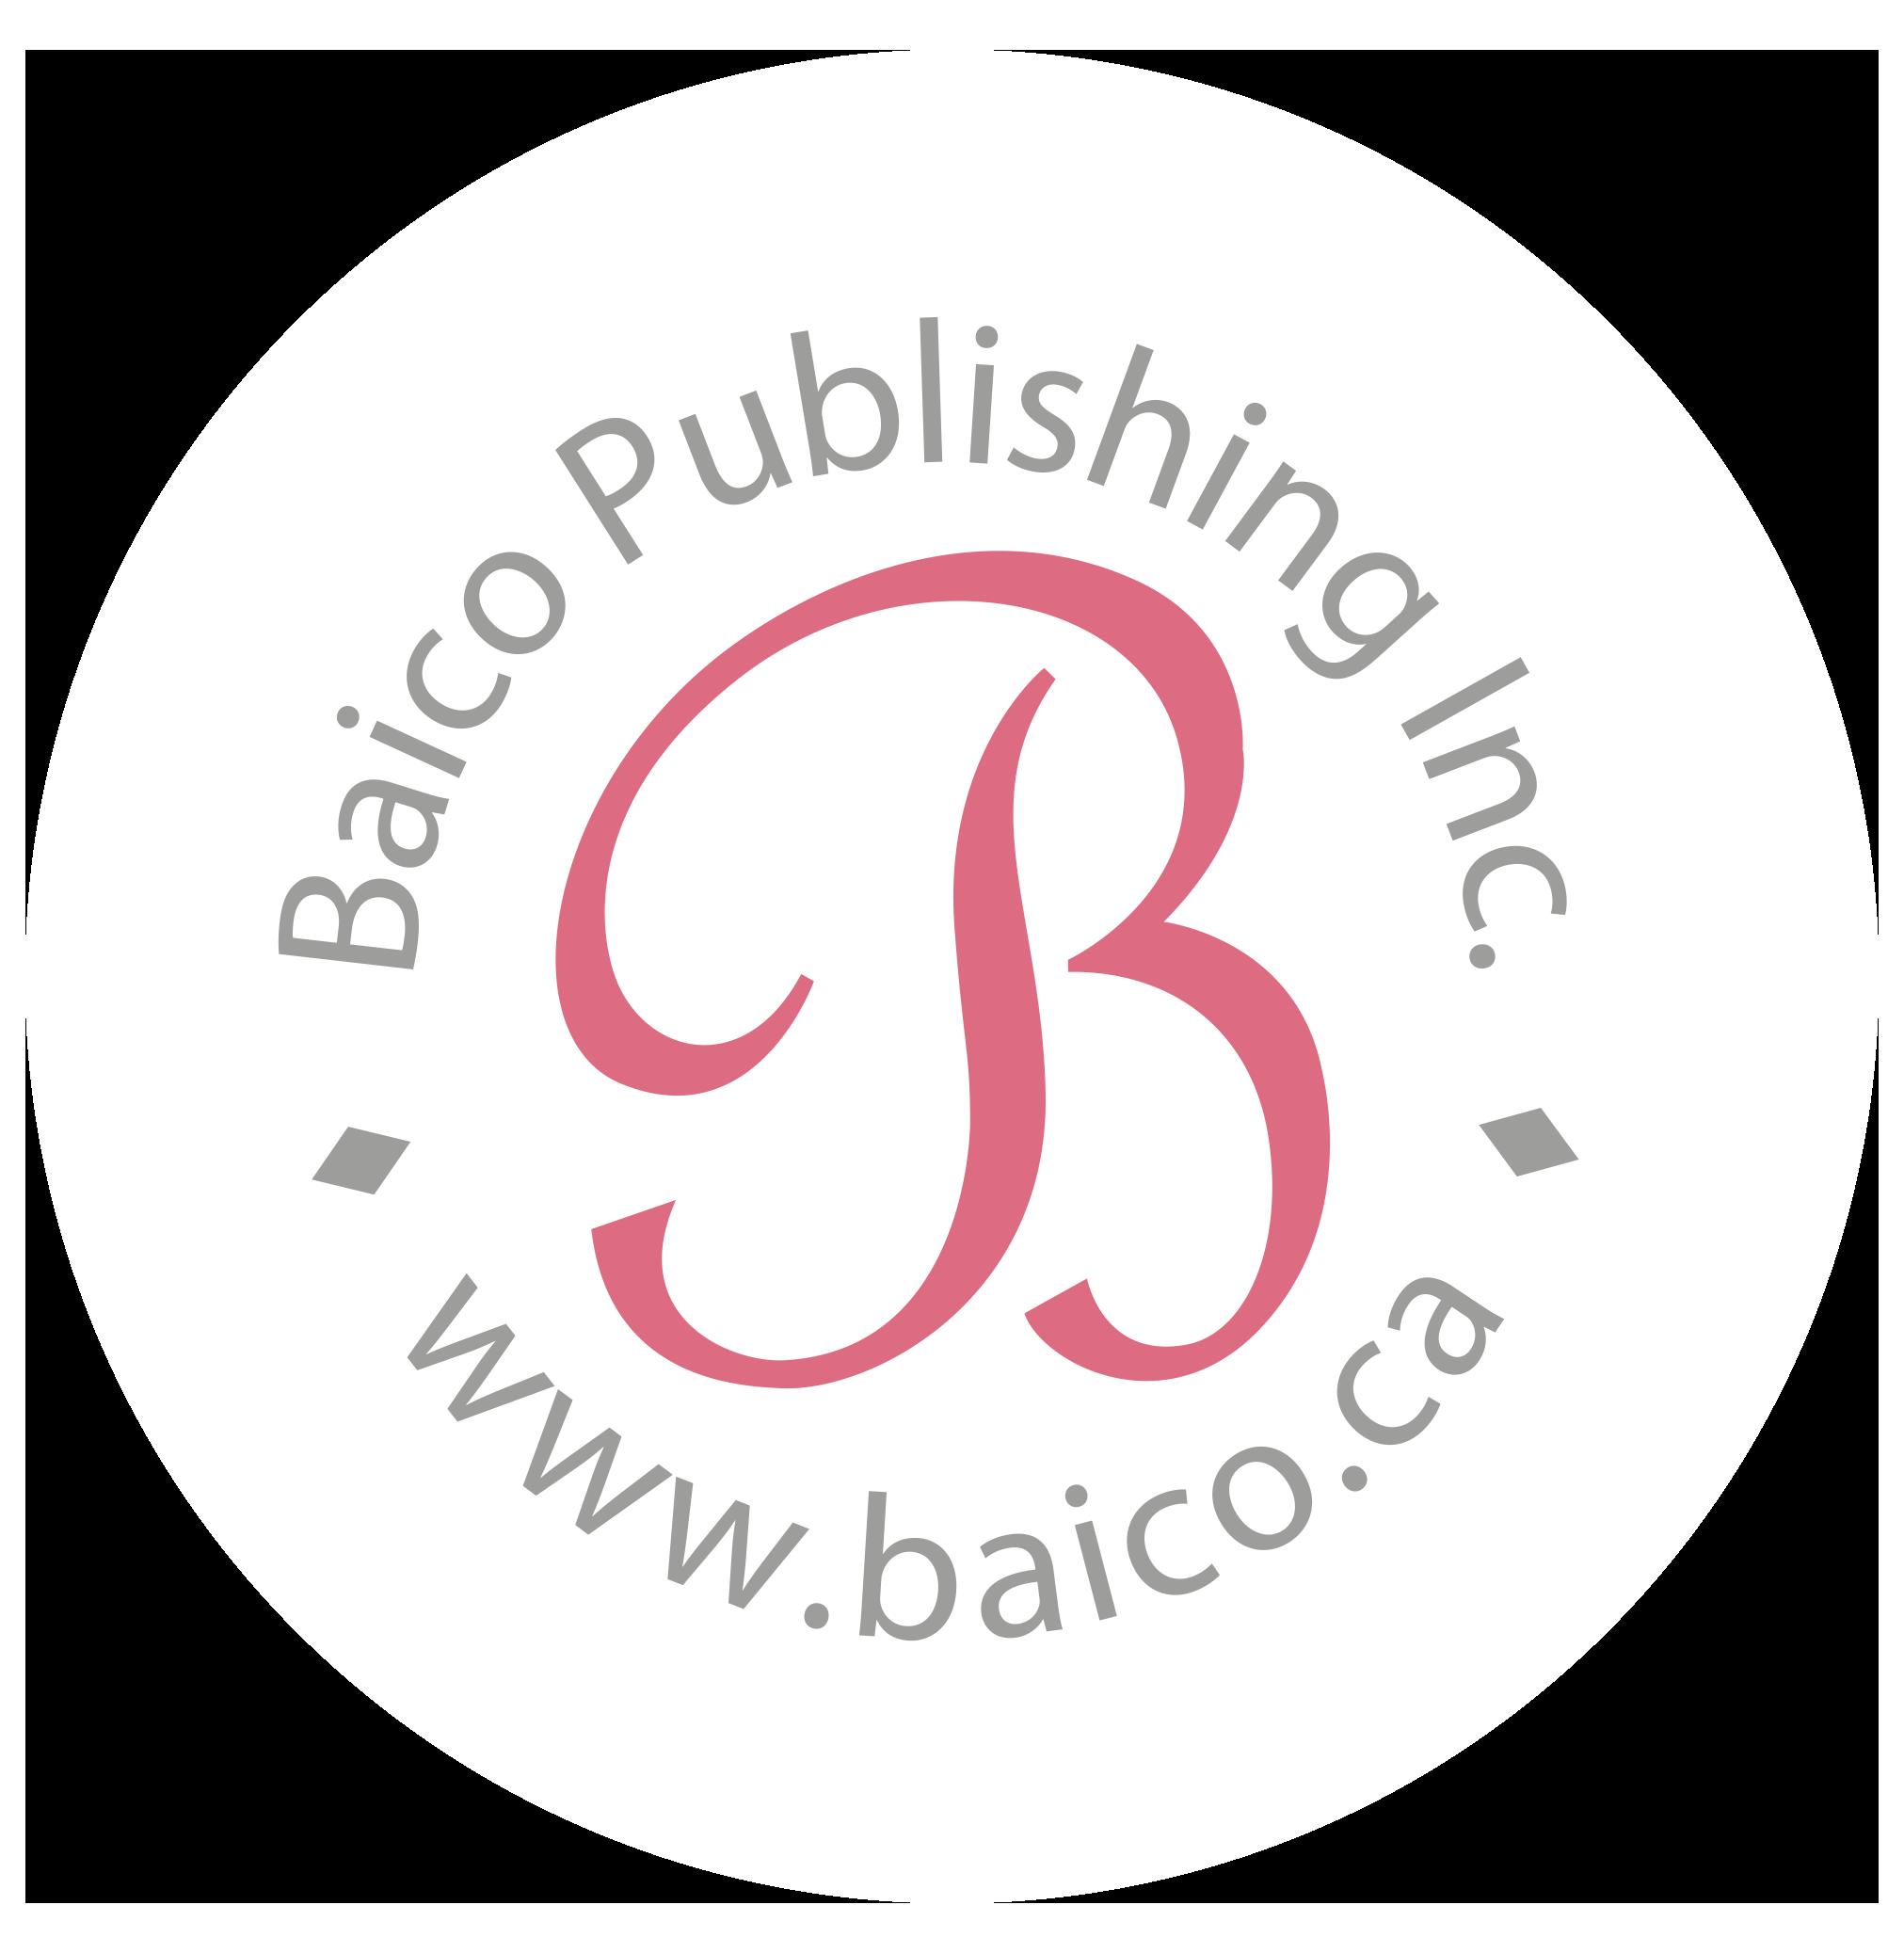 Baico Logo